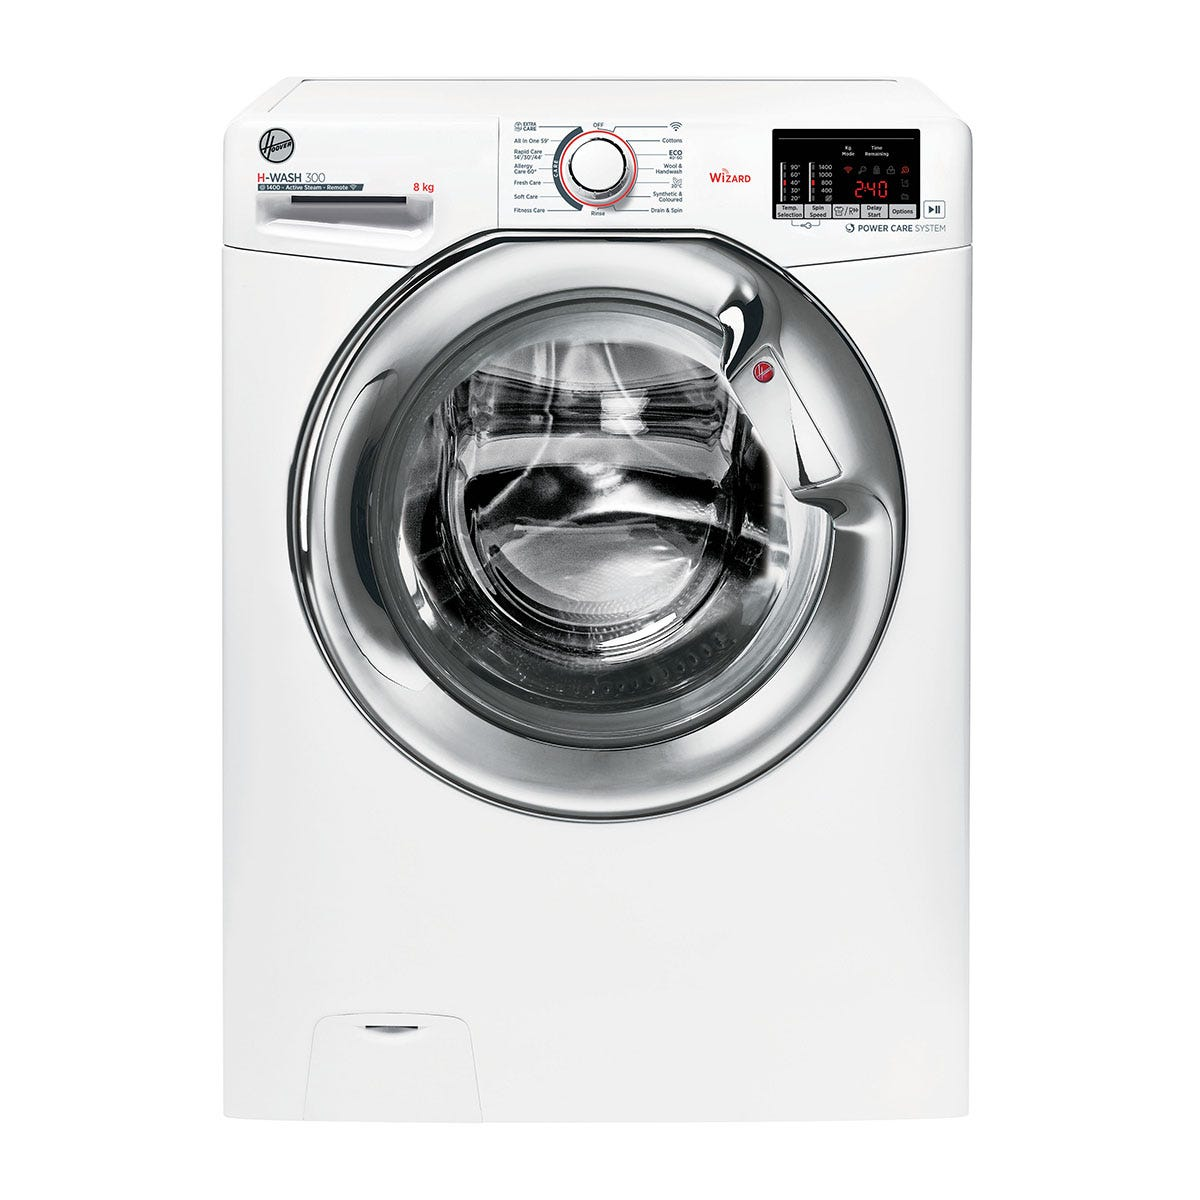 Hoover H3WS485DACE H-Wash 300 8kg 1400rpm Digital WiFi Washing Machine - White/Chrome